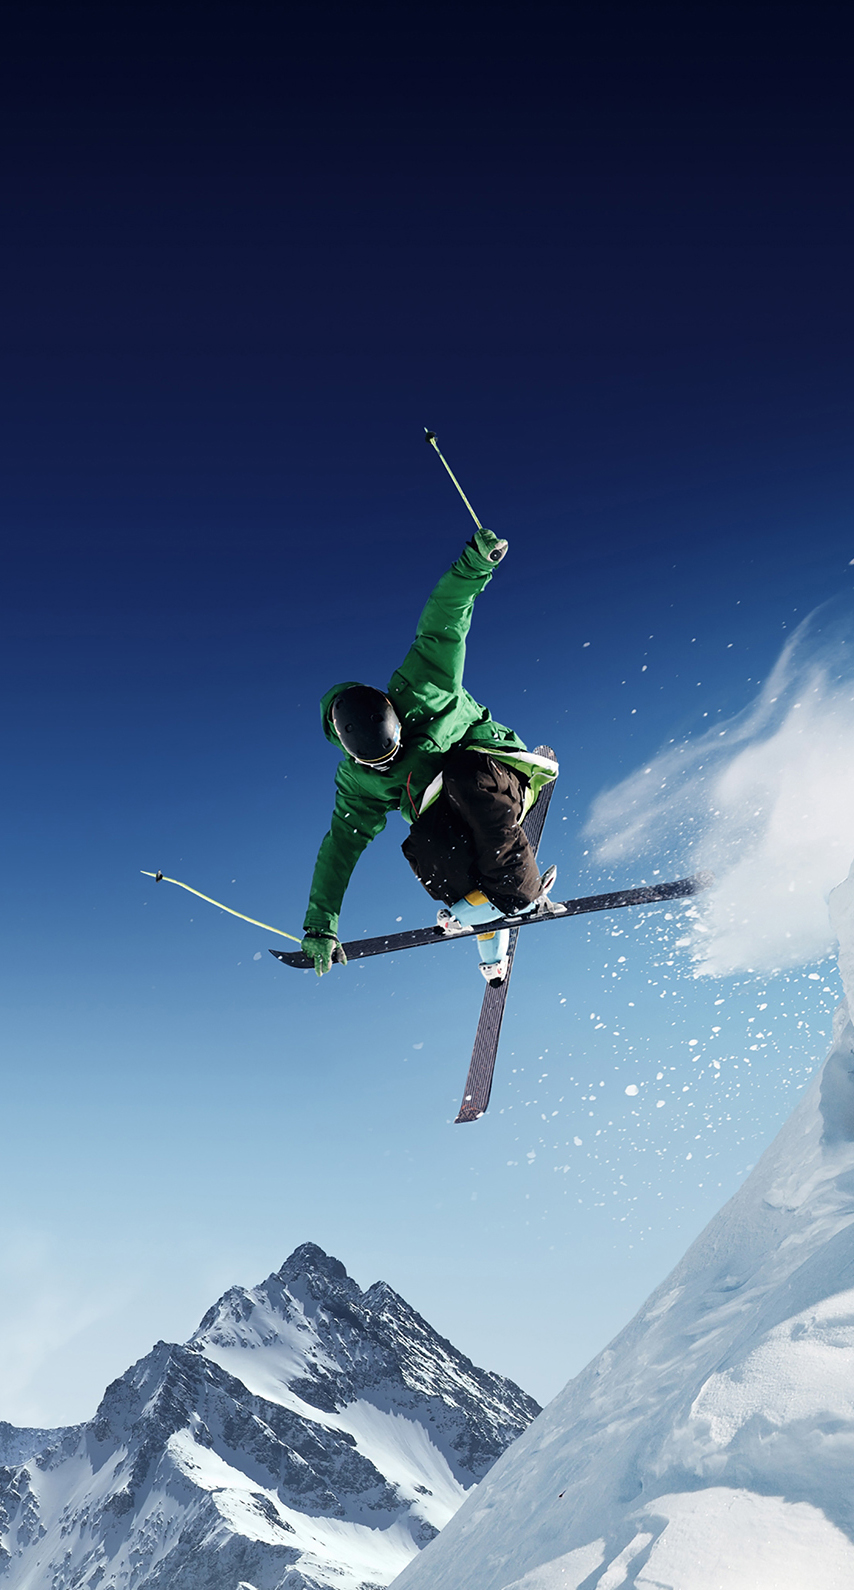 snowboard, exhilaration